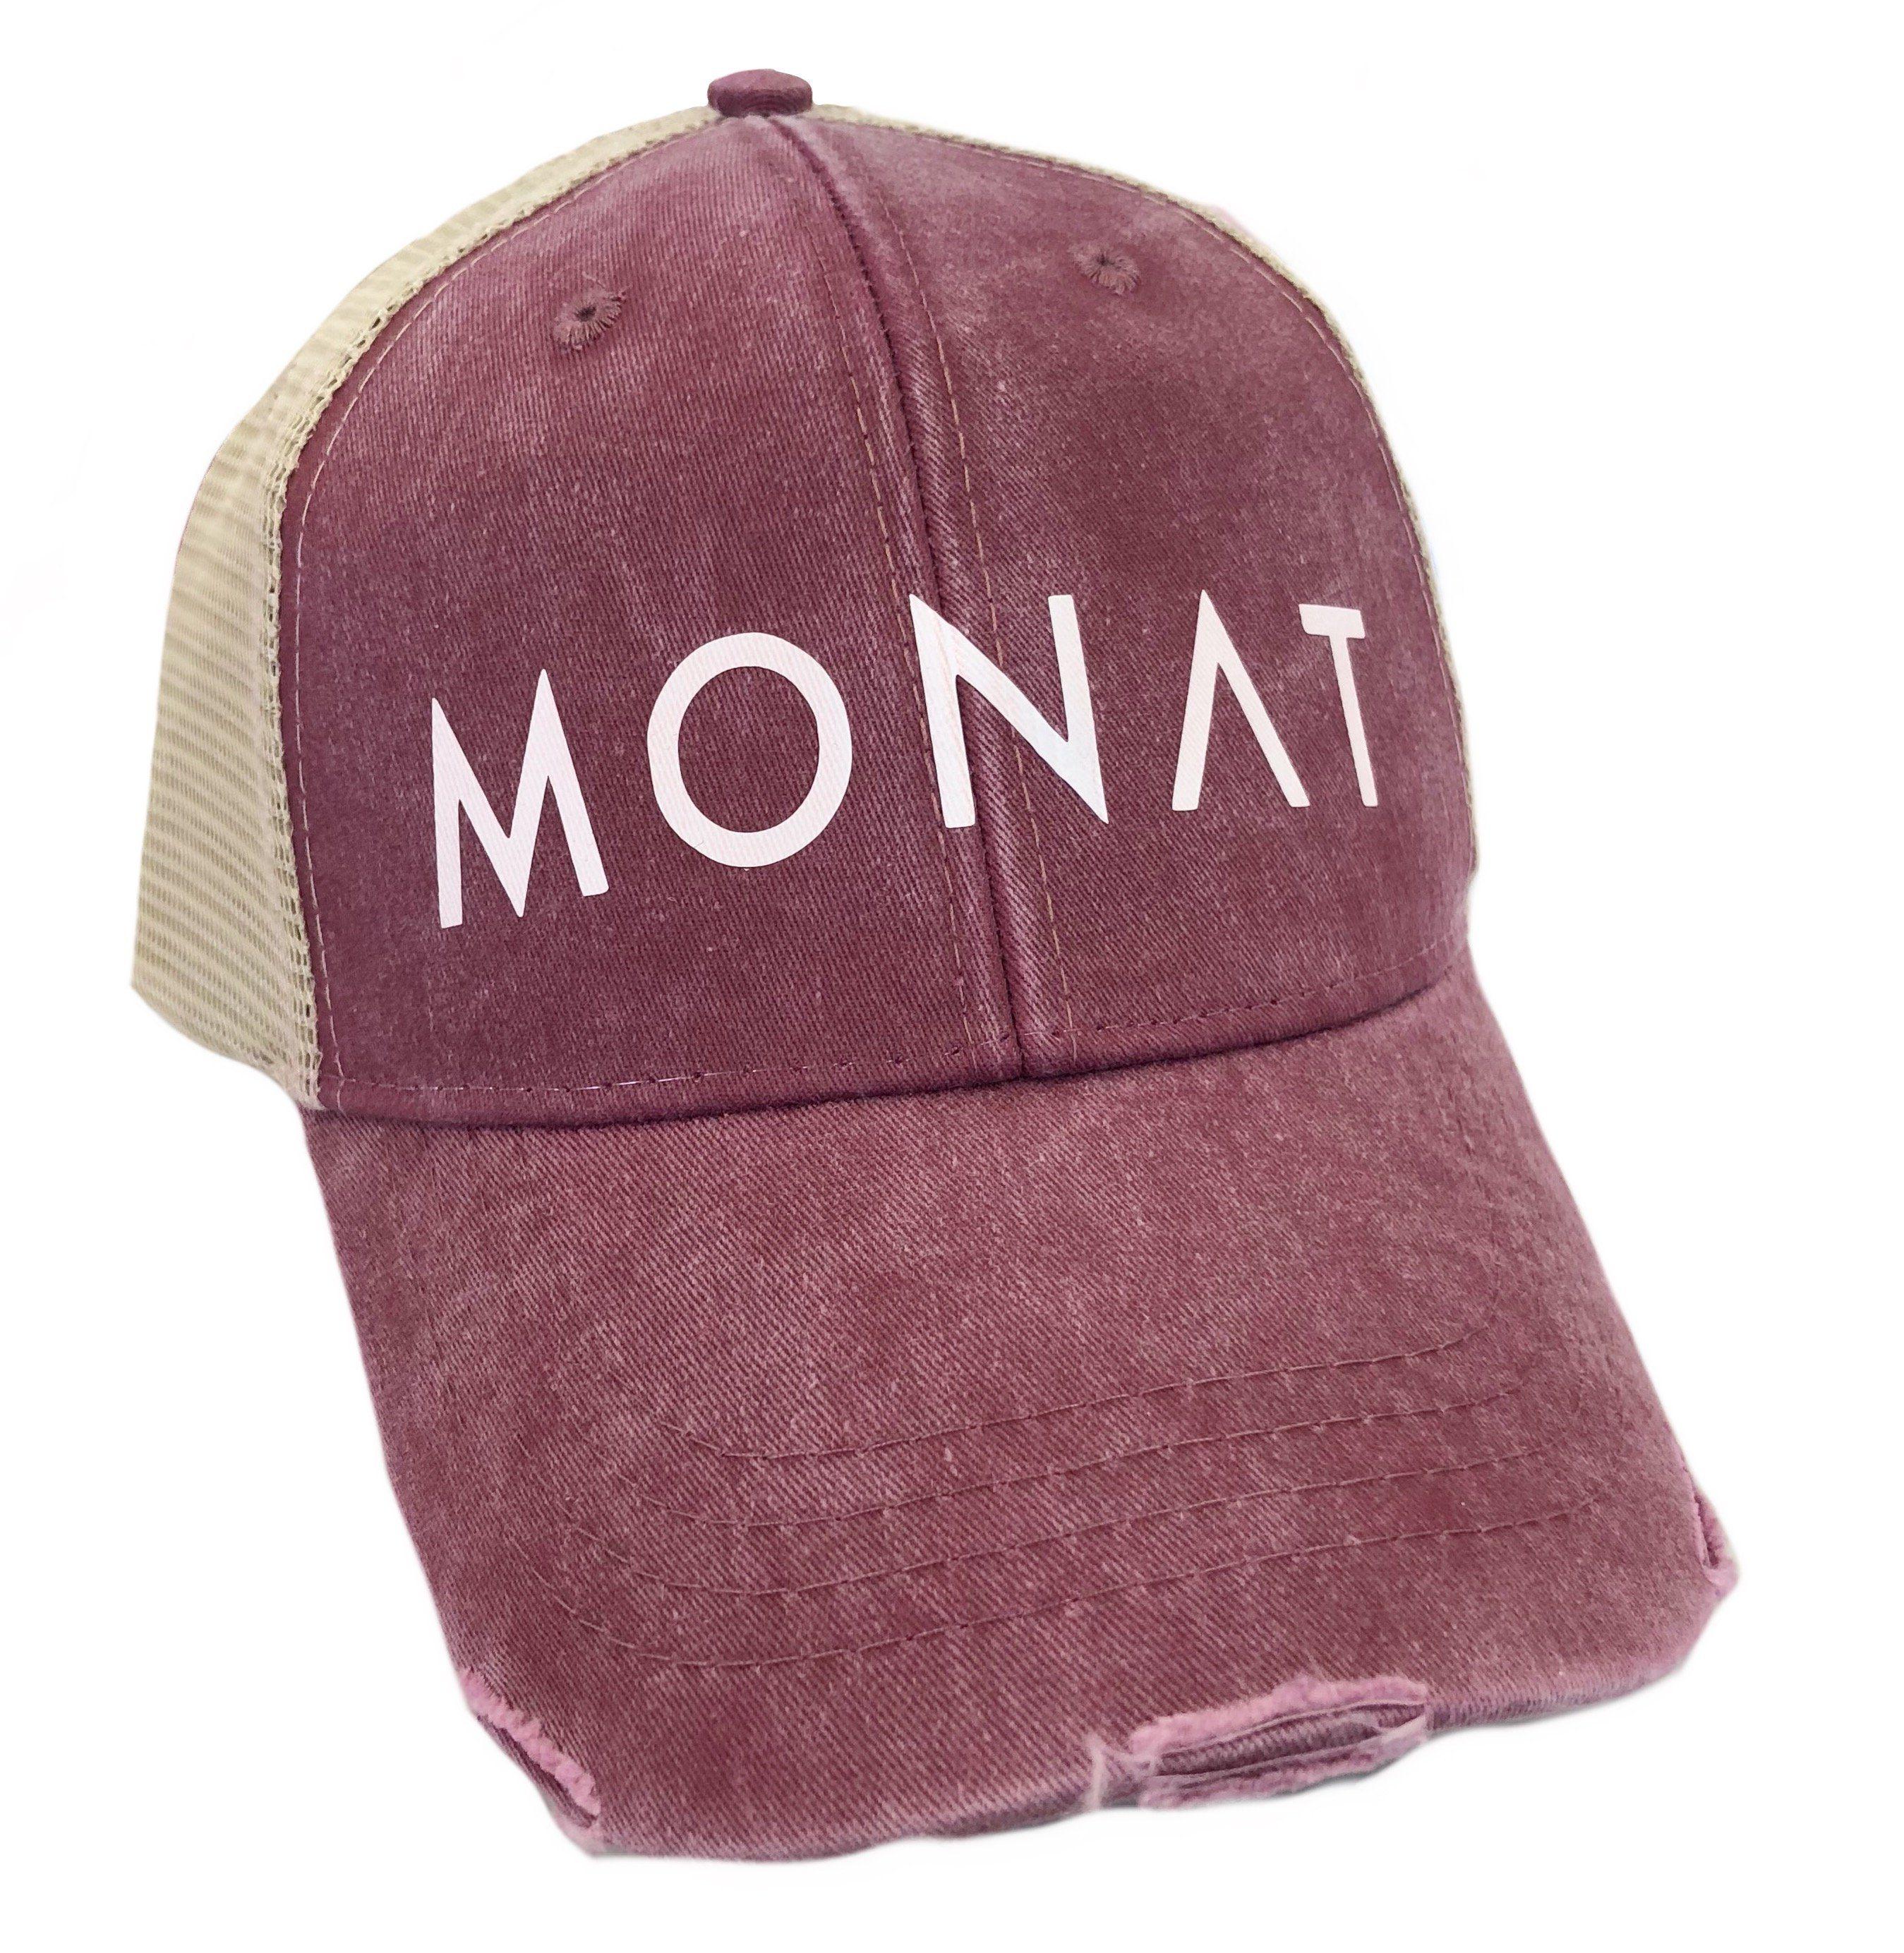 Monat Burgundy Hat